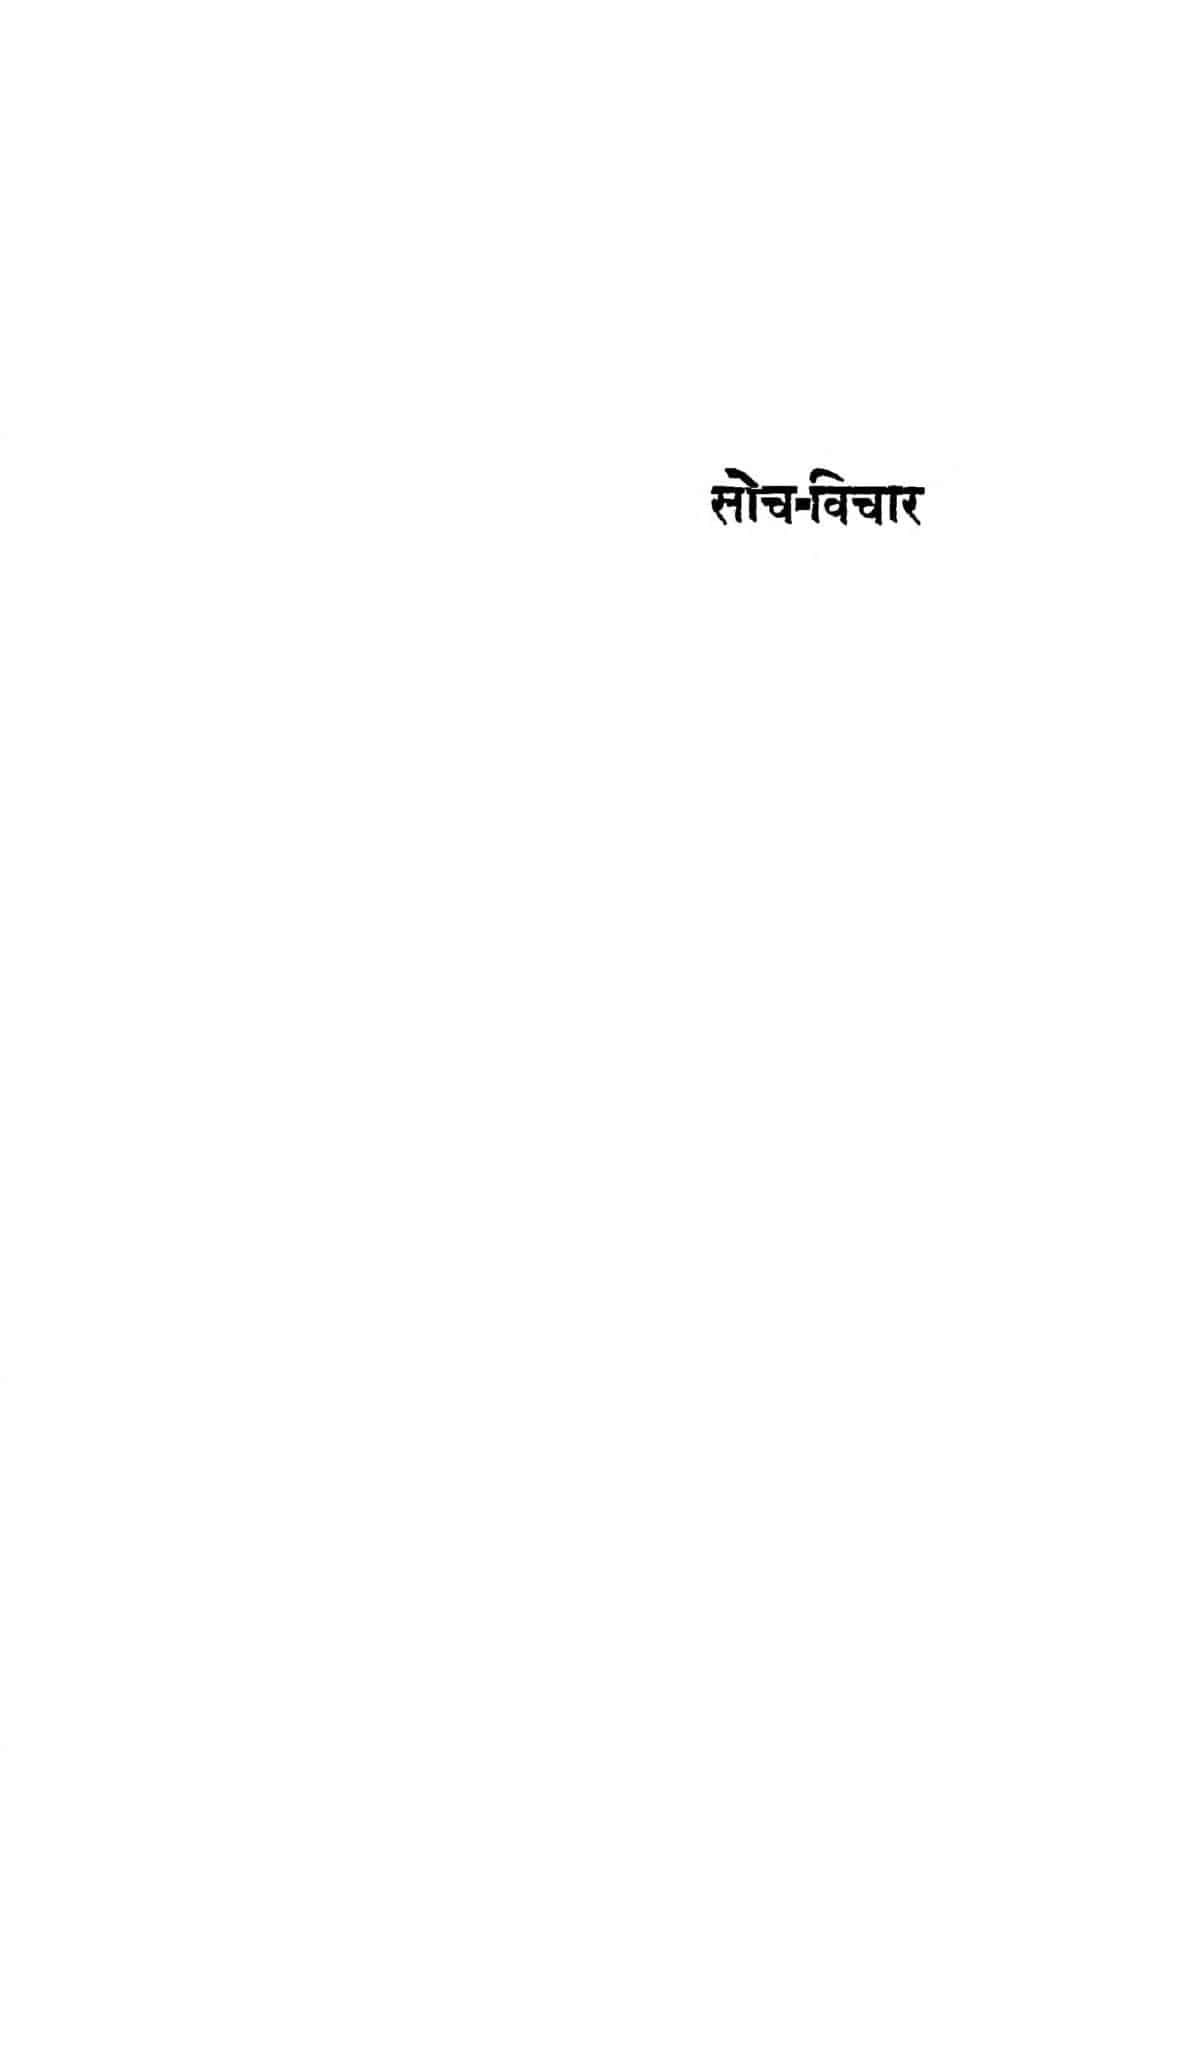 Book Image : सोच विचार - Soch-Vichar